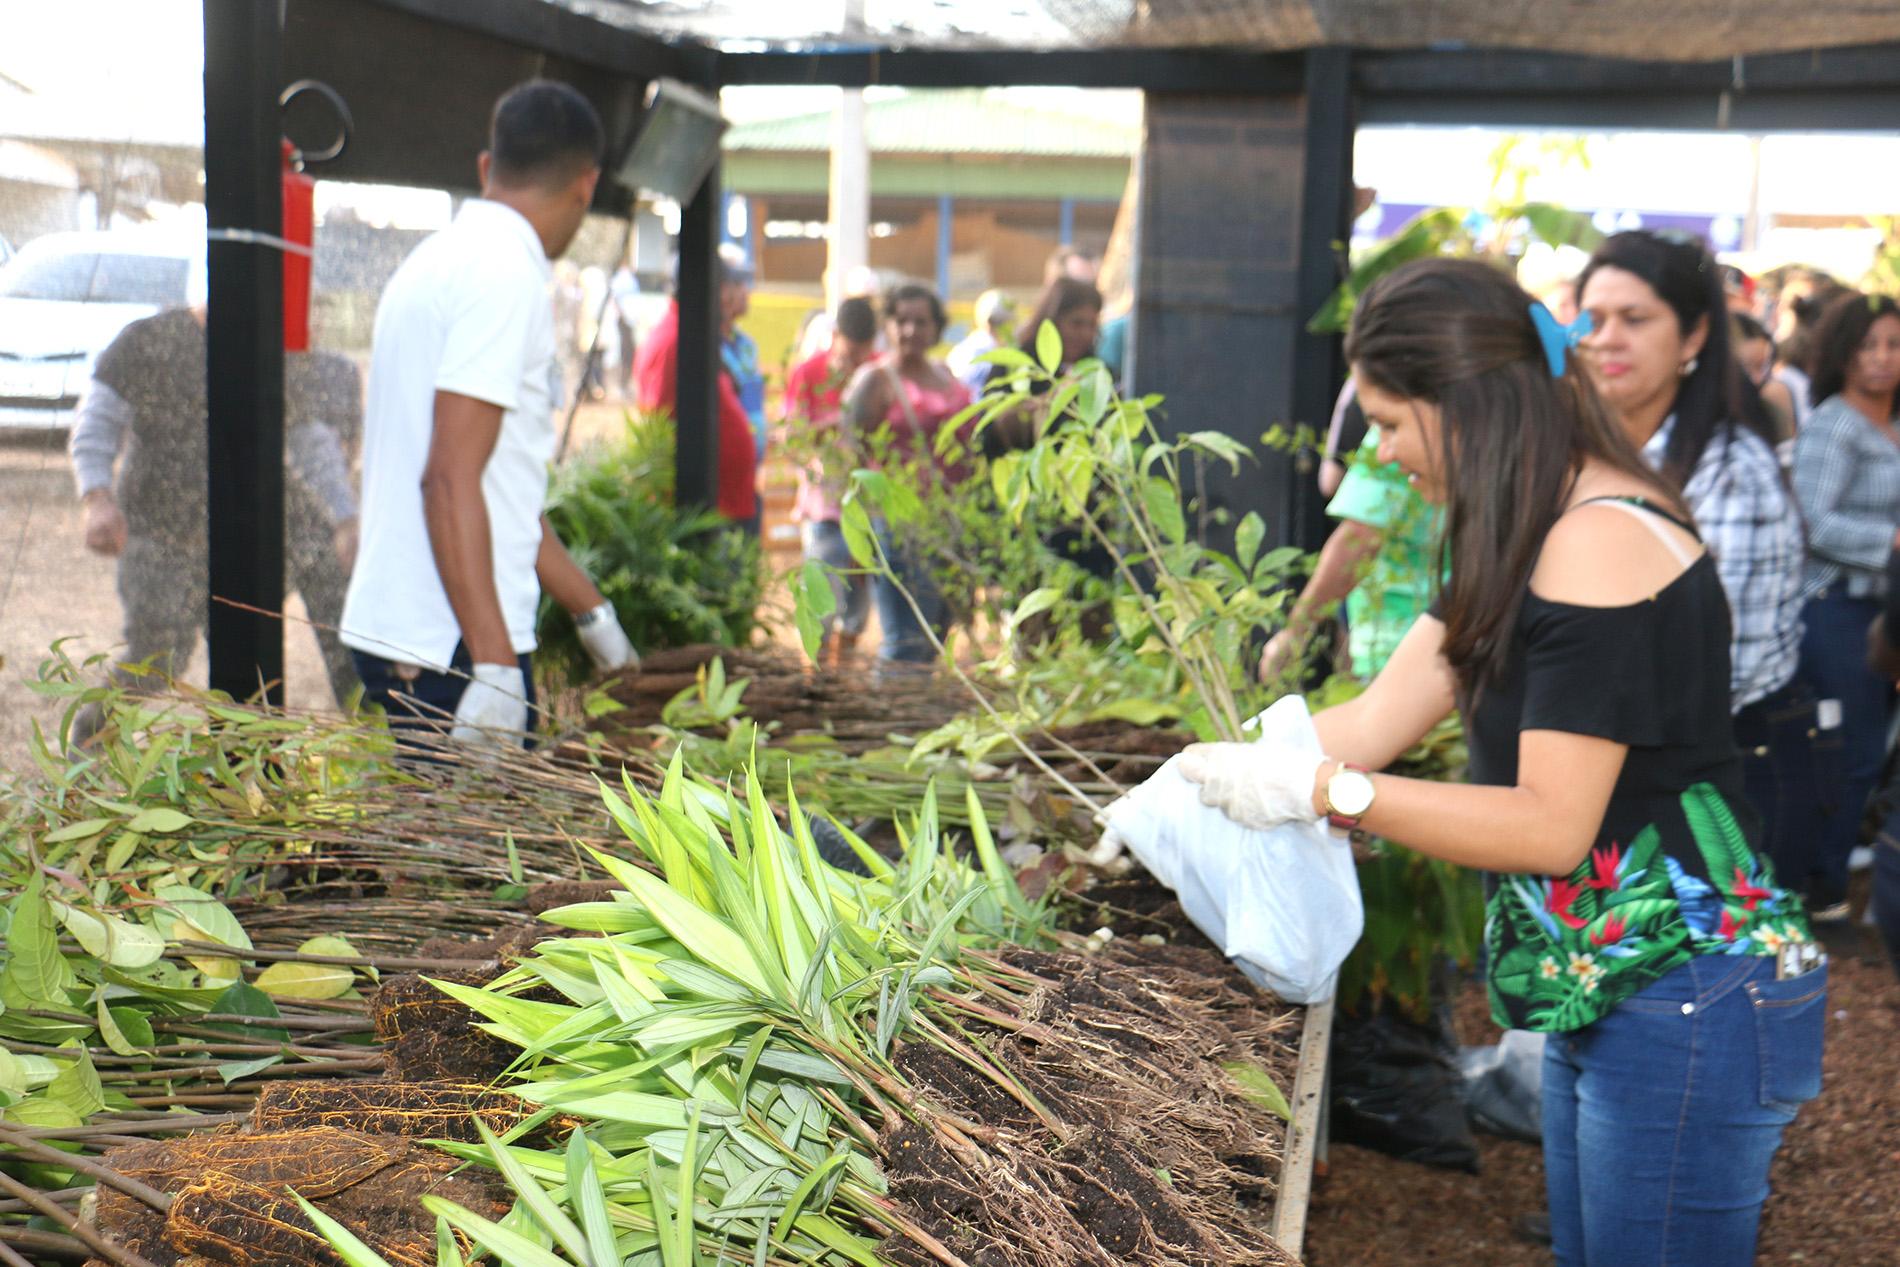 Viveiro da Floresta distribui mais de 5 mil mudas de plantas na Expoacre